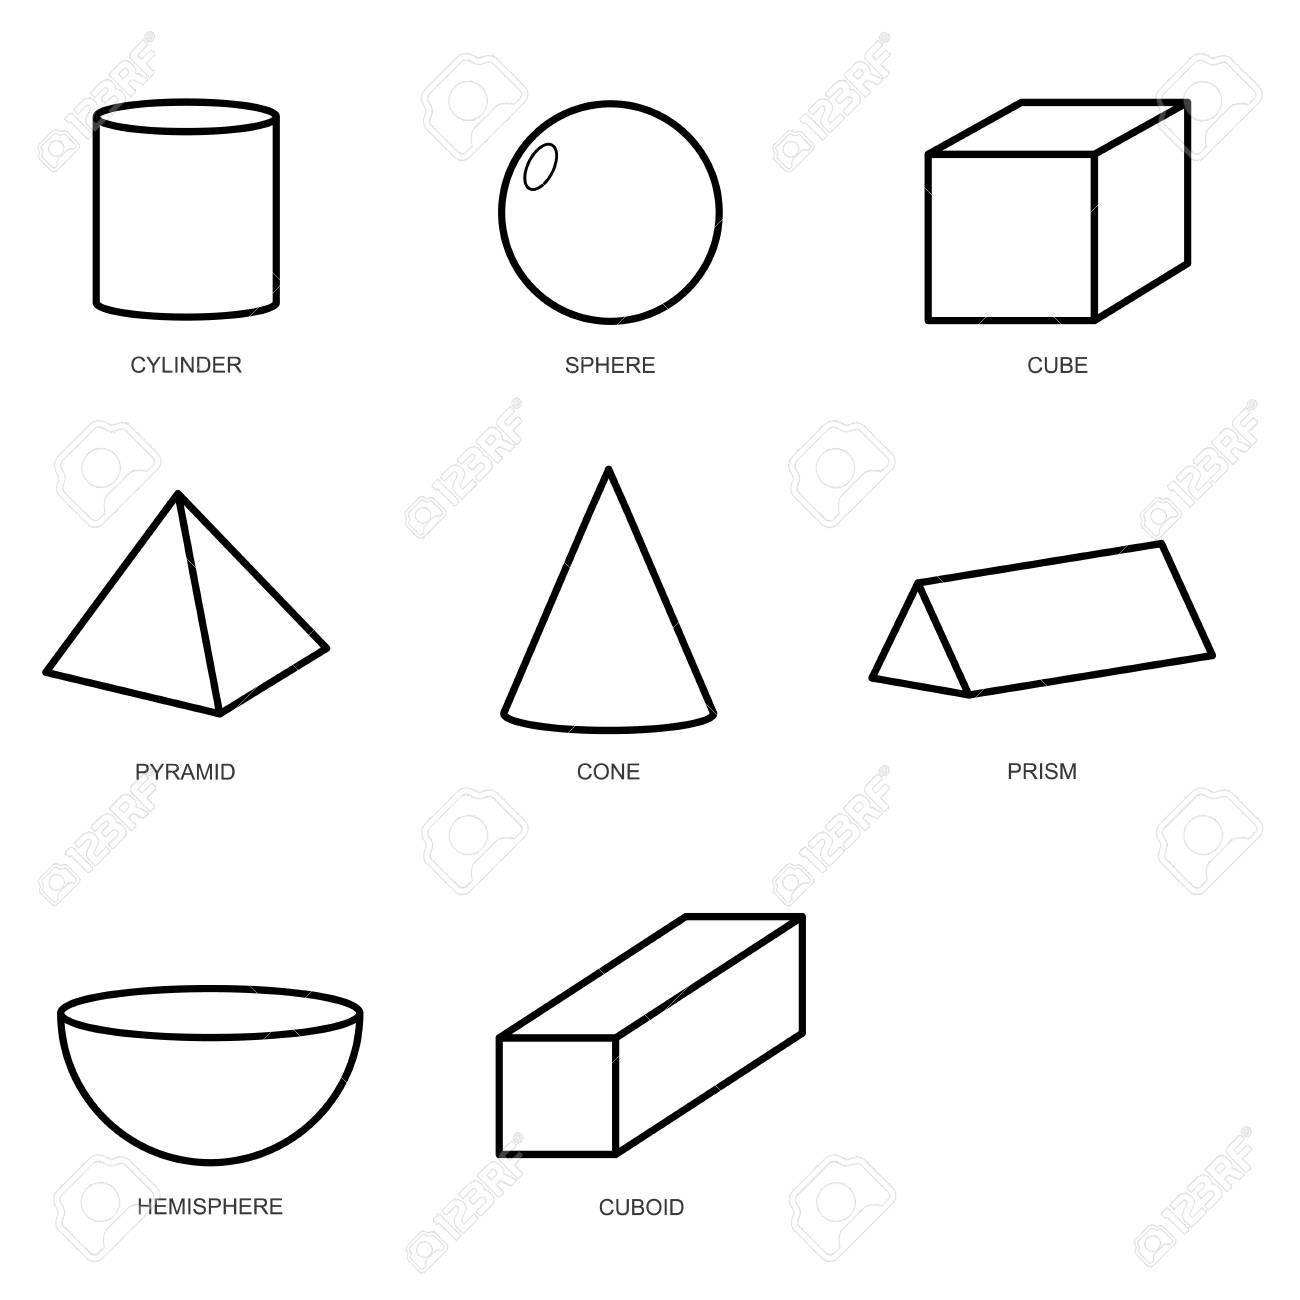 3d shape set isolated on white background vector.illustration